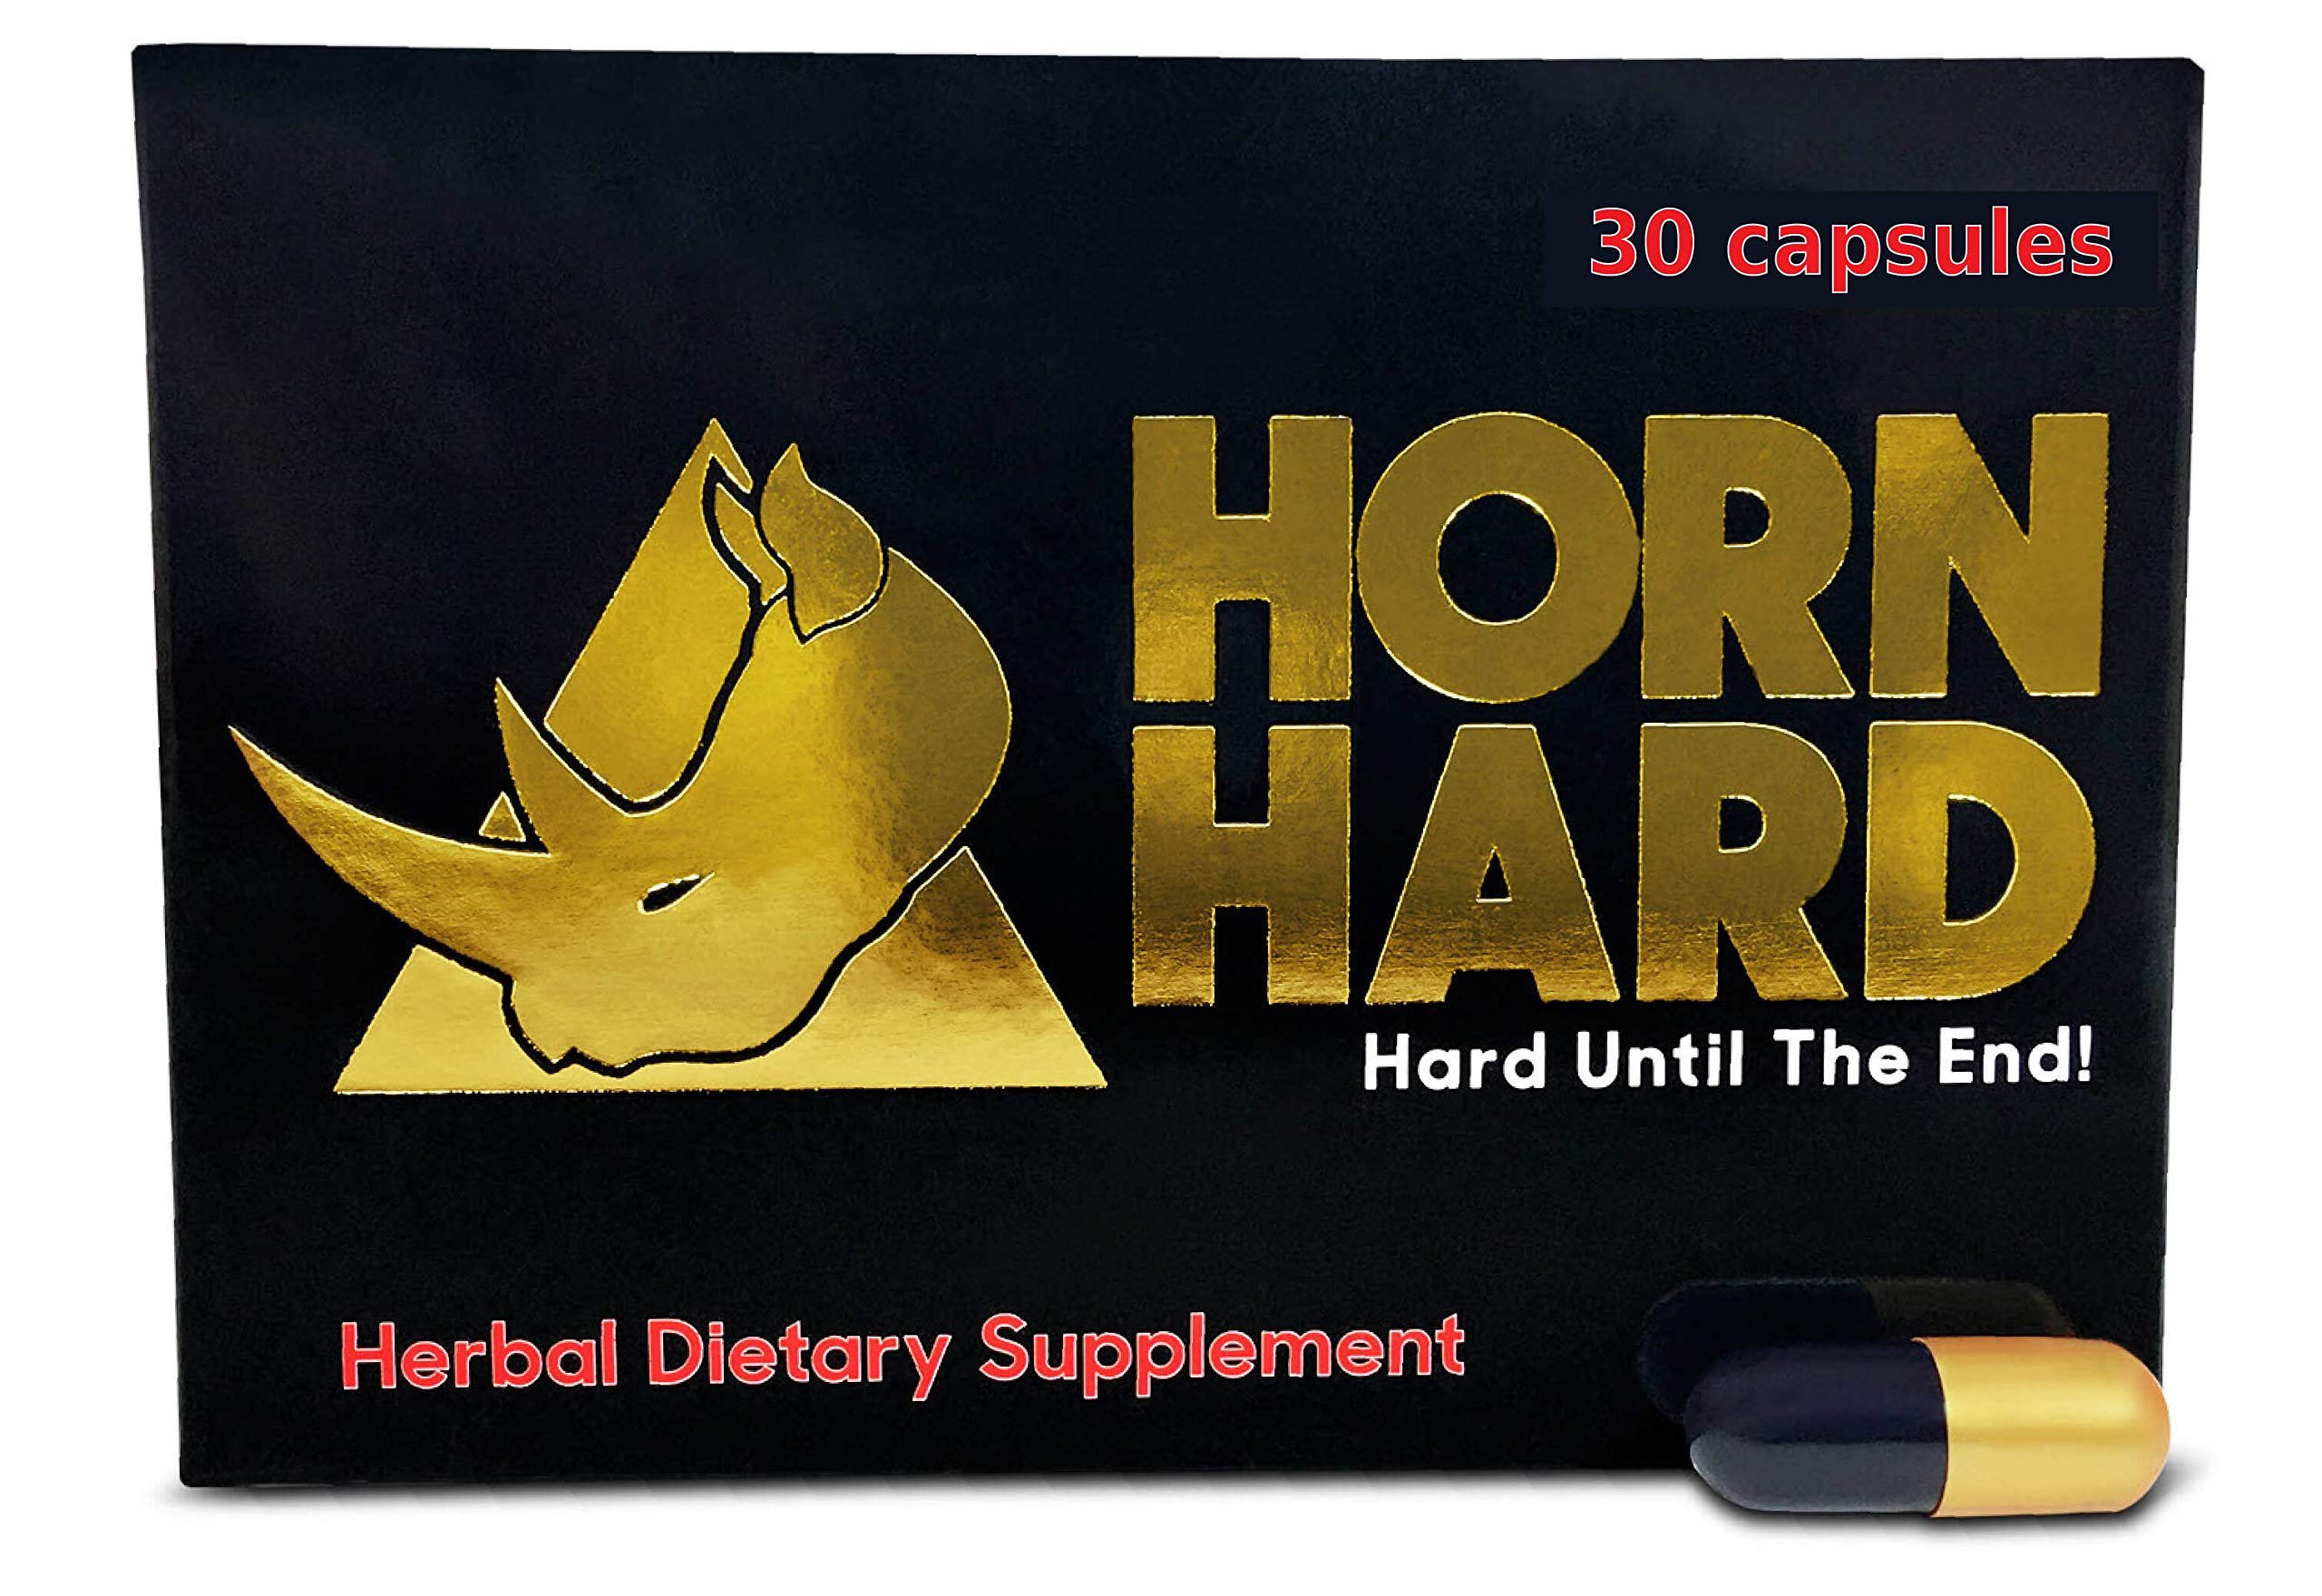 Horn Hard (30 Caps) Male Performance, Energy, Enhancement, and Endurance